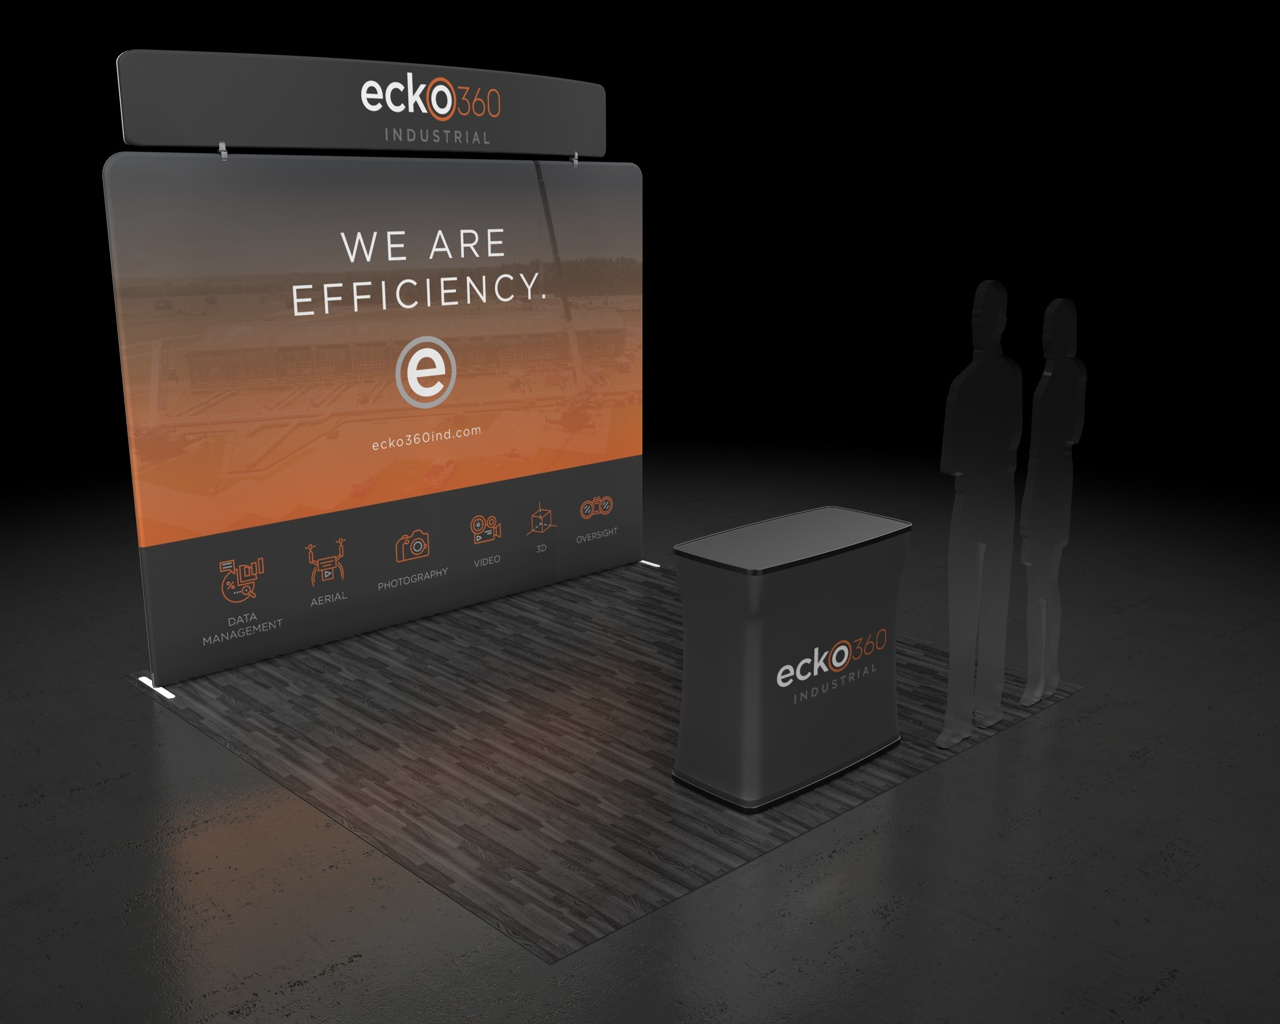 Ecko 360